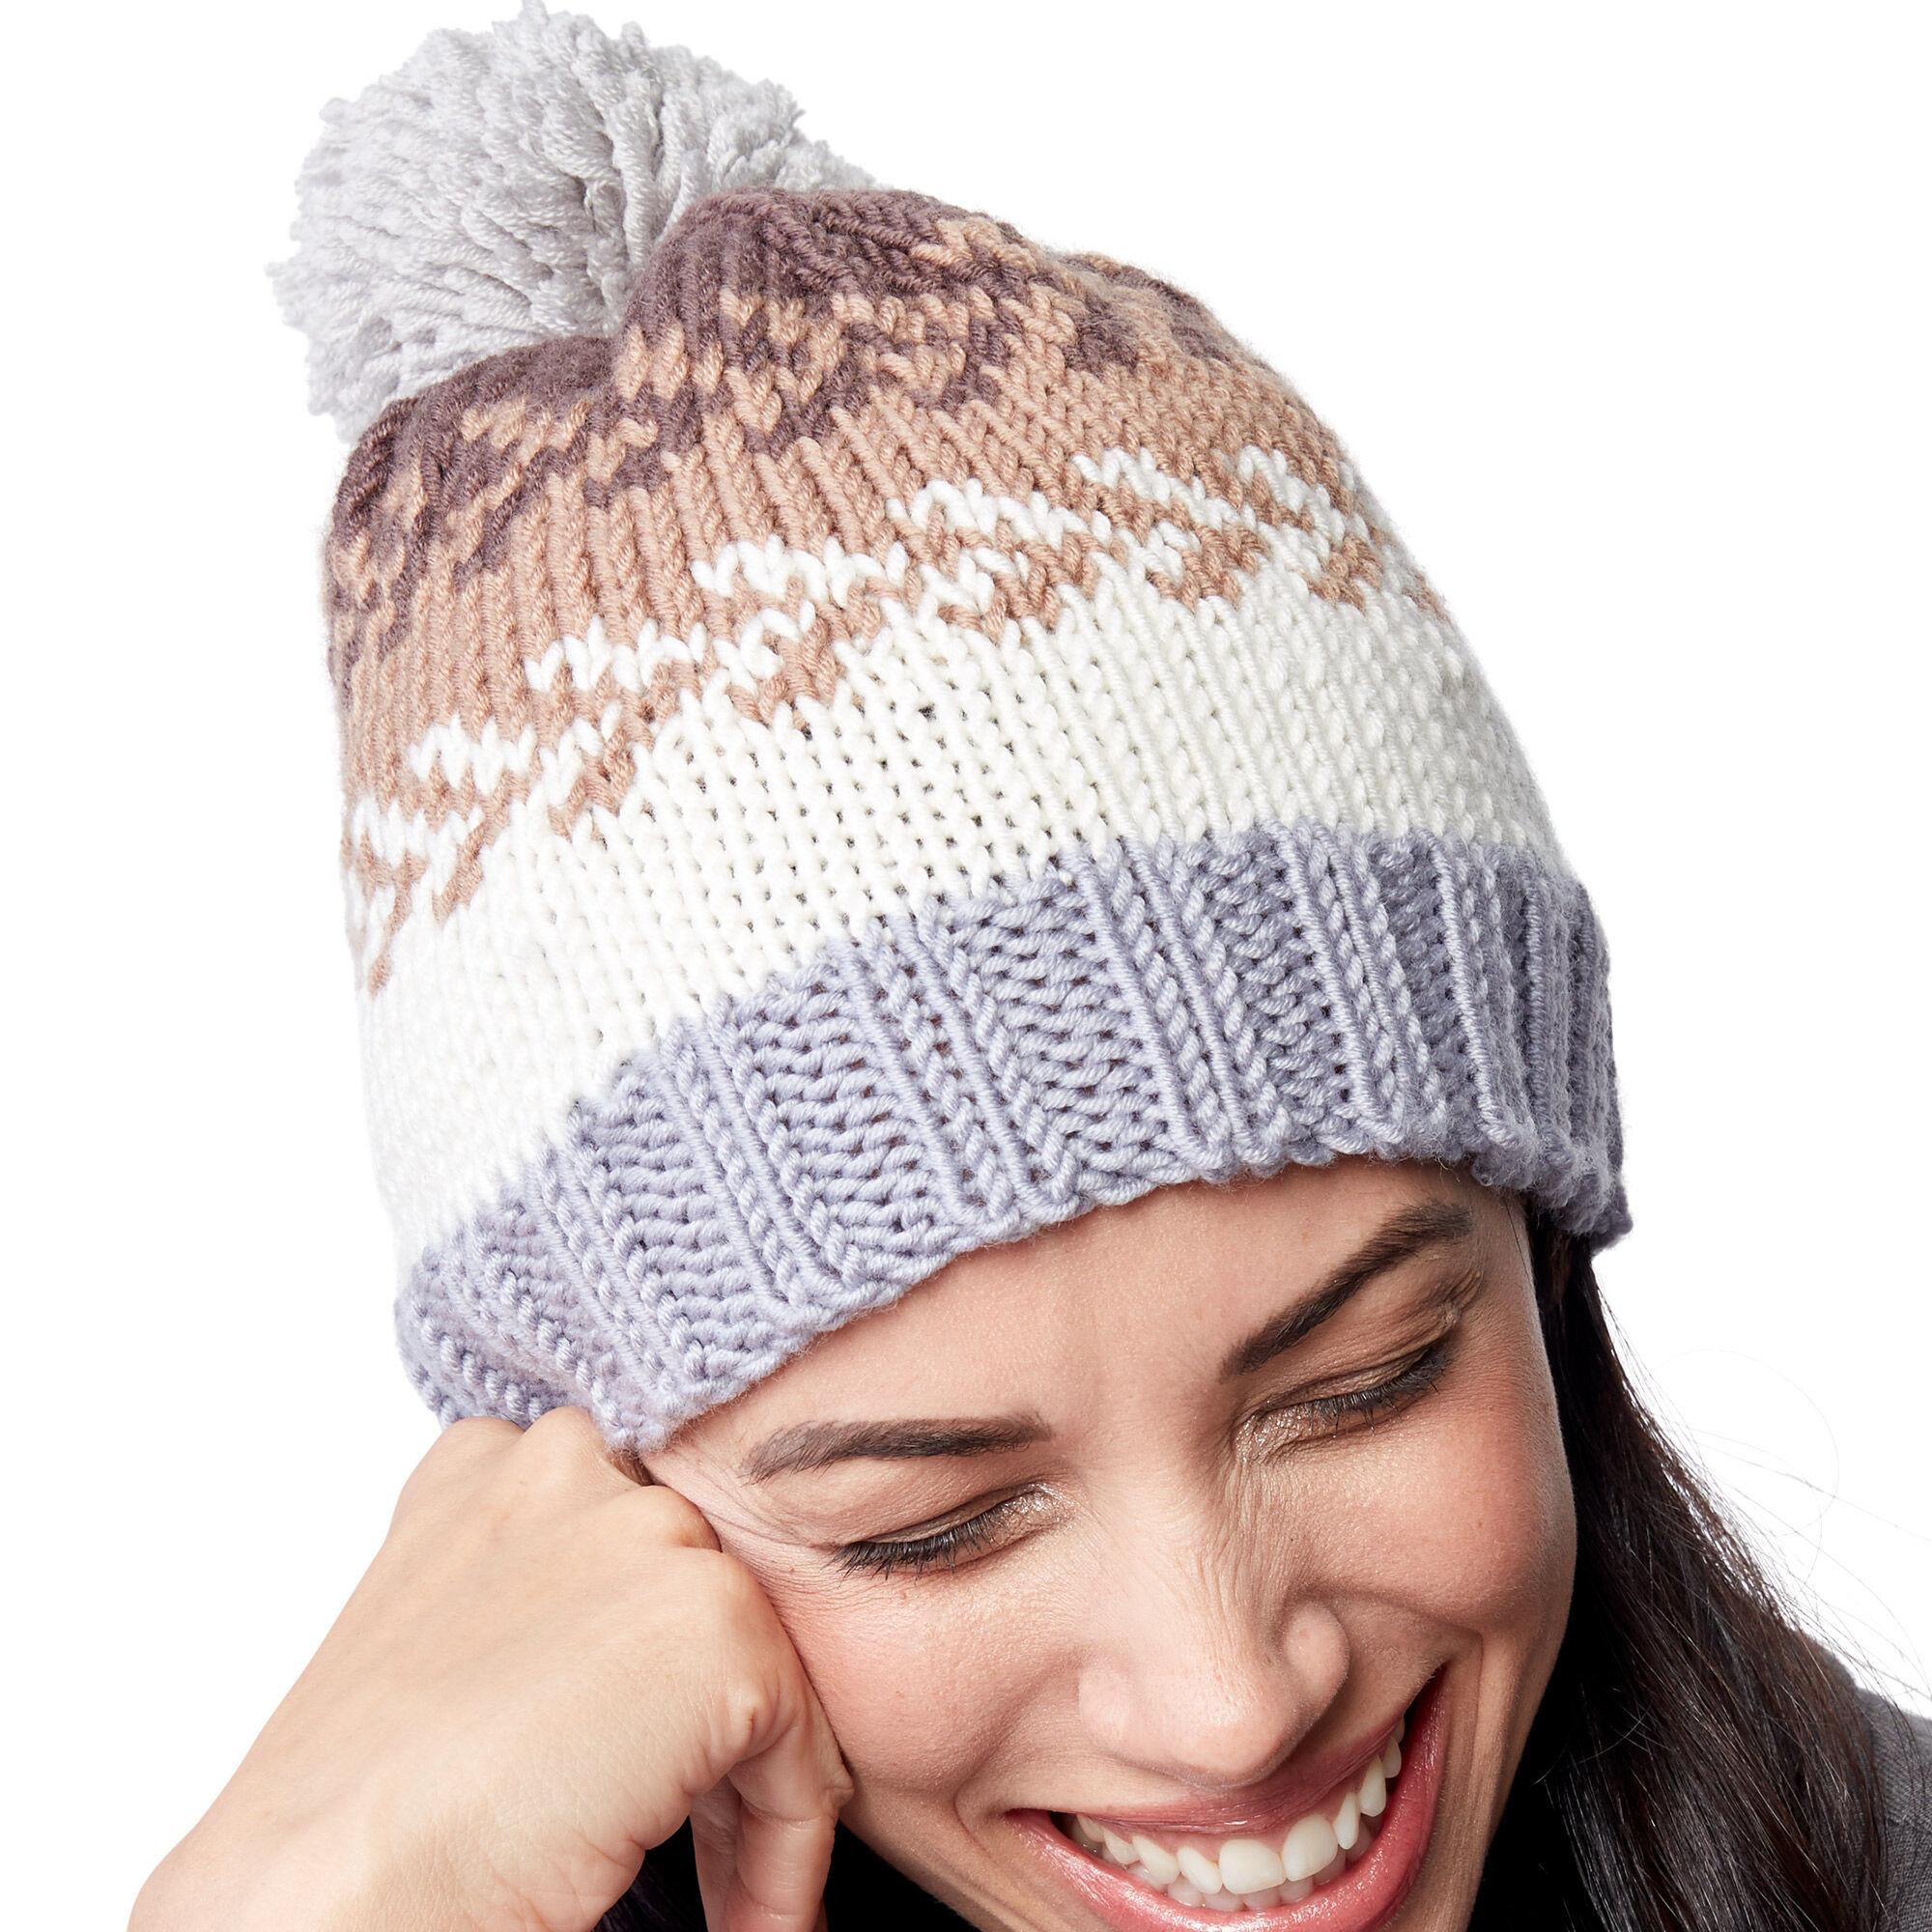 Caron x Pantone Knit Fair Isle Hat Free Pattern | Yarnspirations